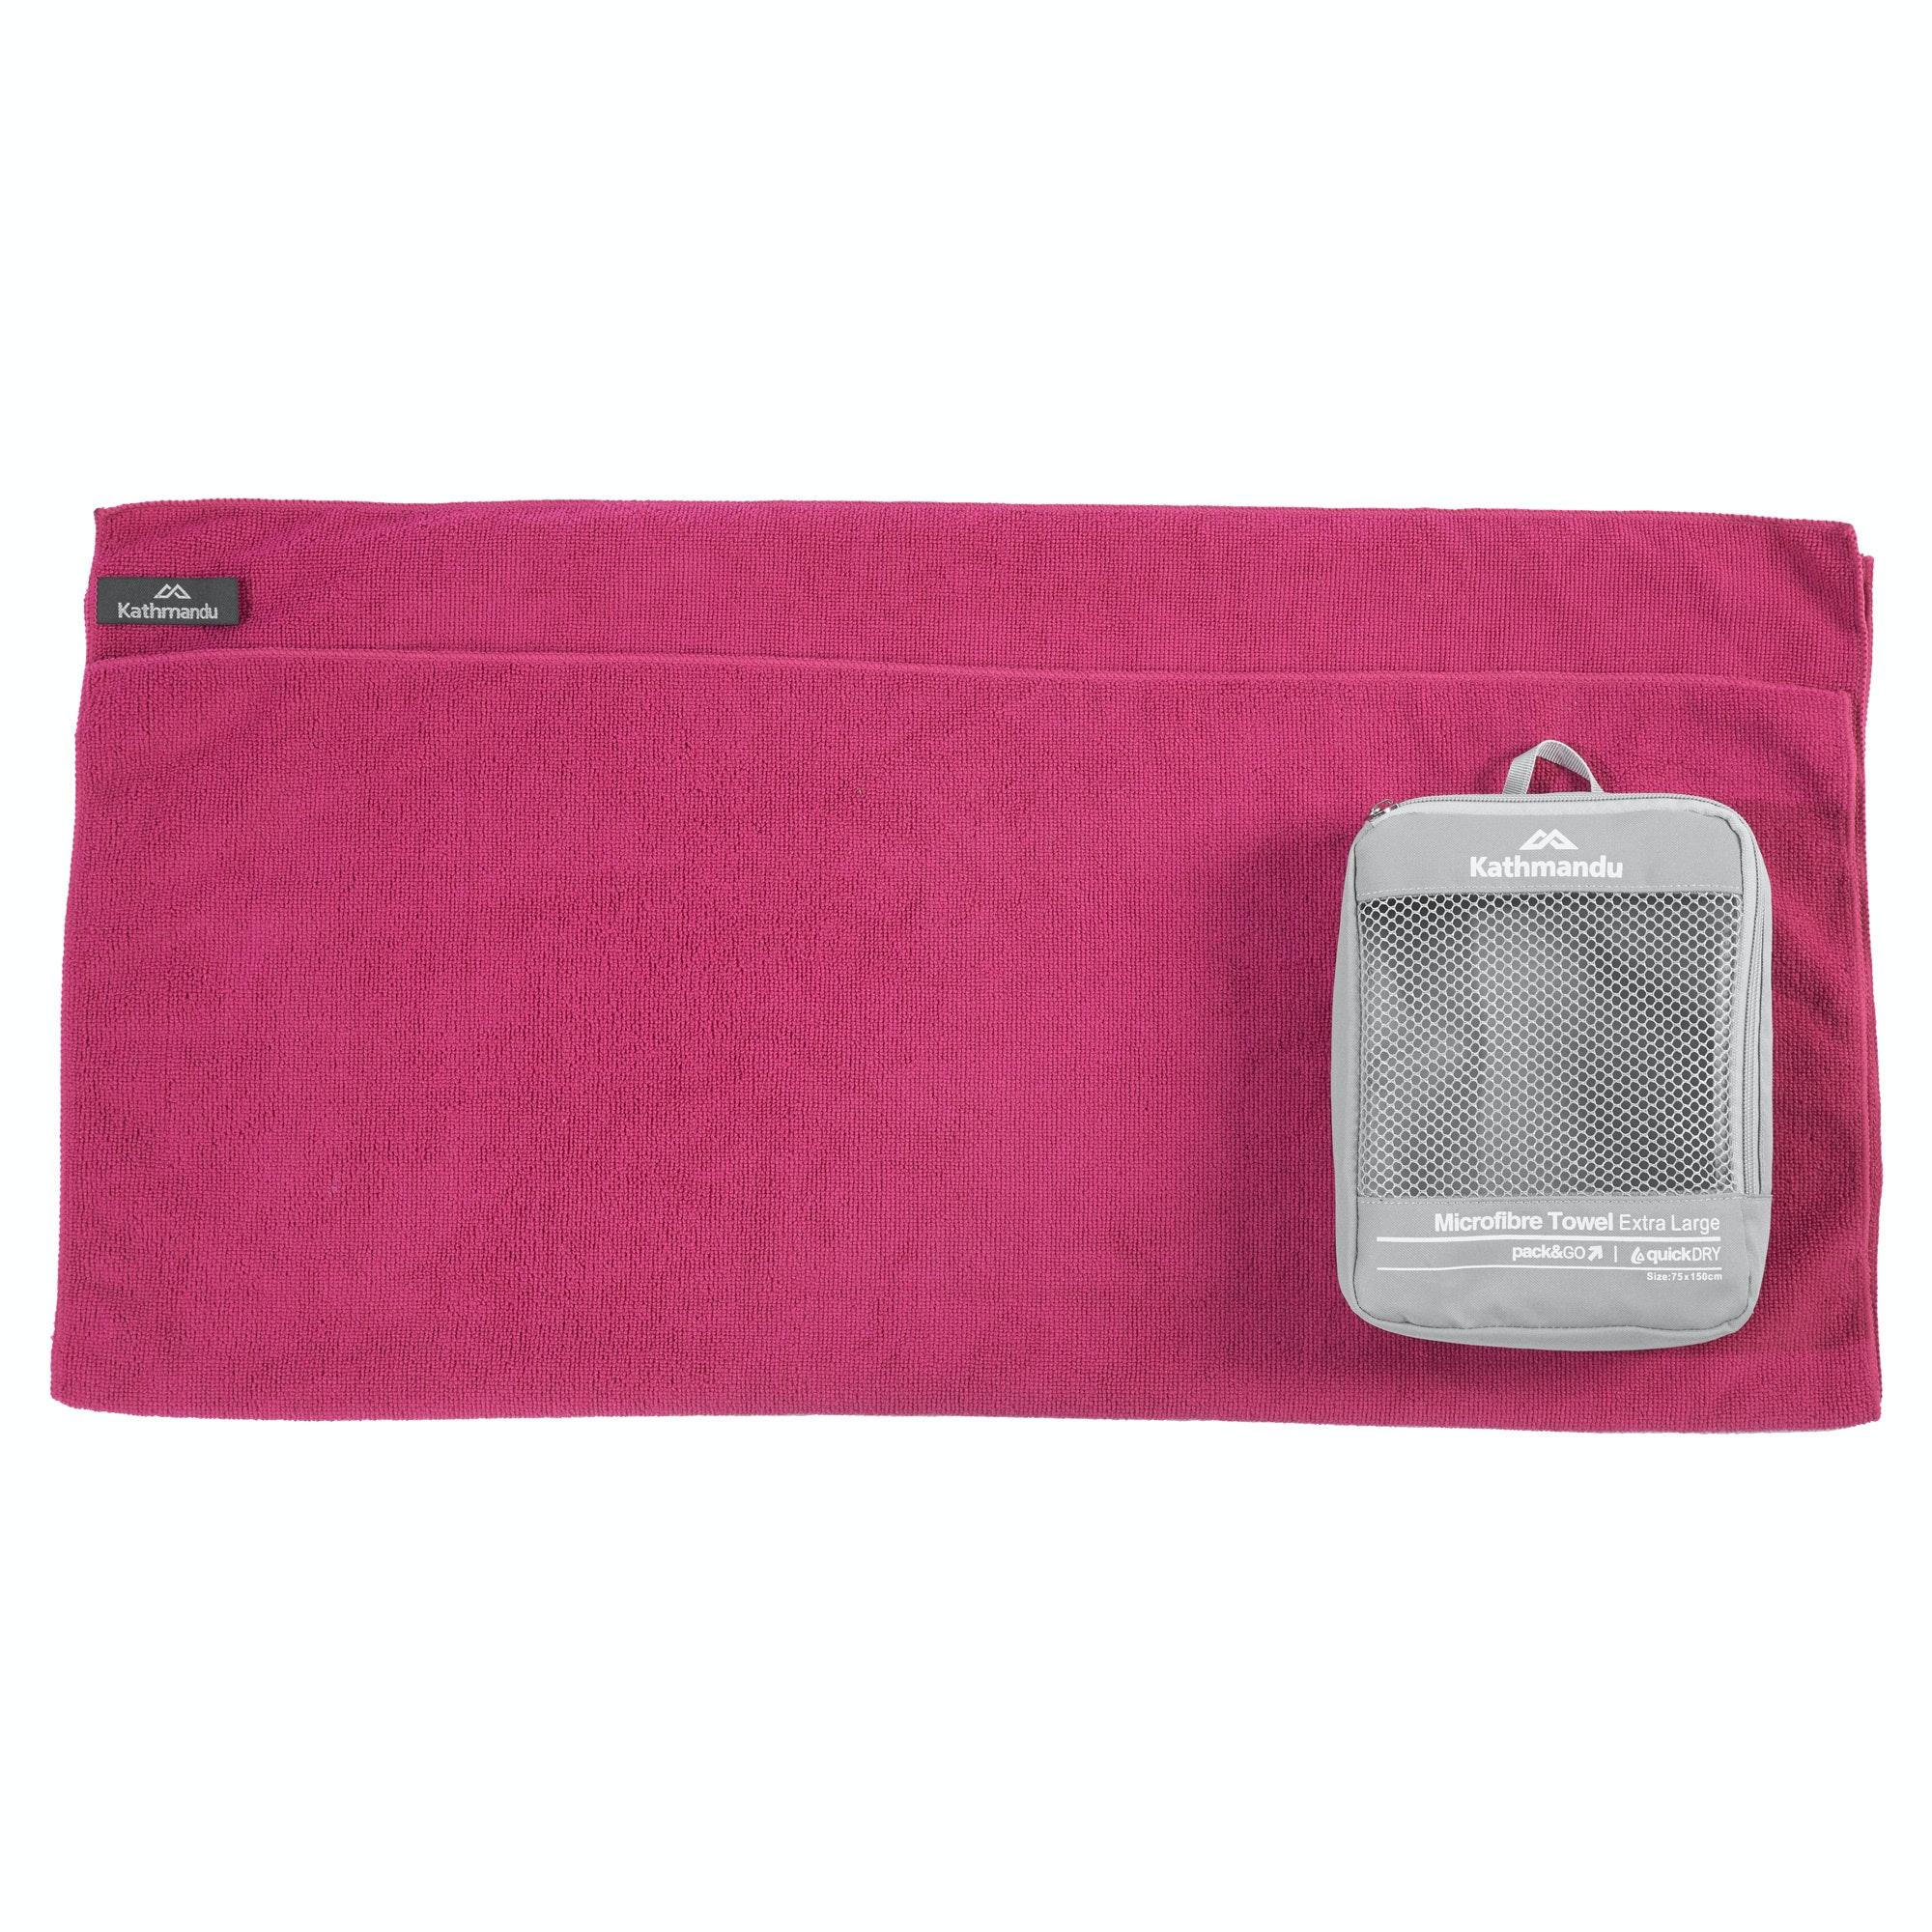 Towel Interstellar Travel: Kathmandu Microfibre Quick Dry XL Gym Sport Travel Camping